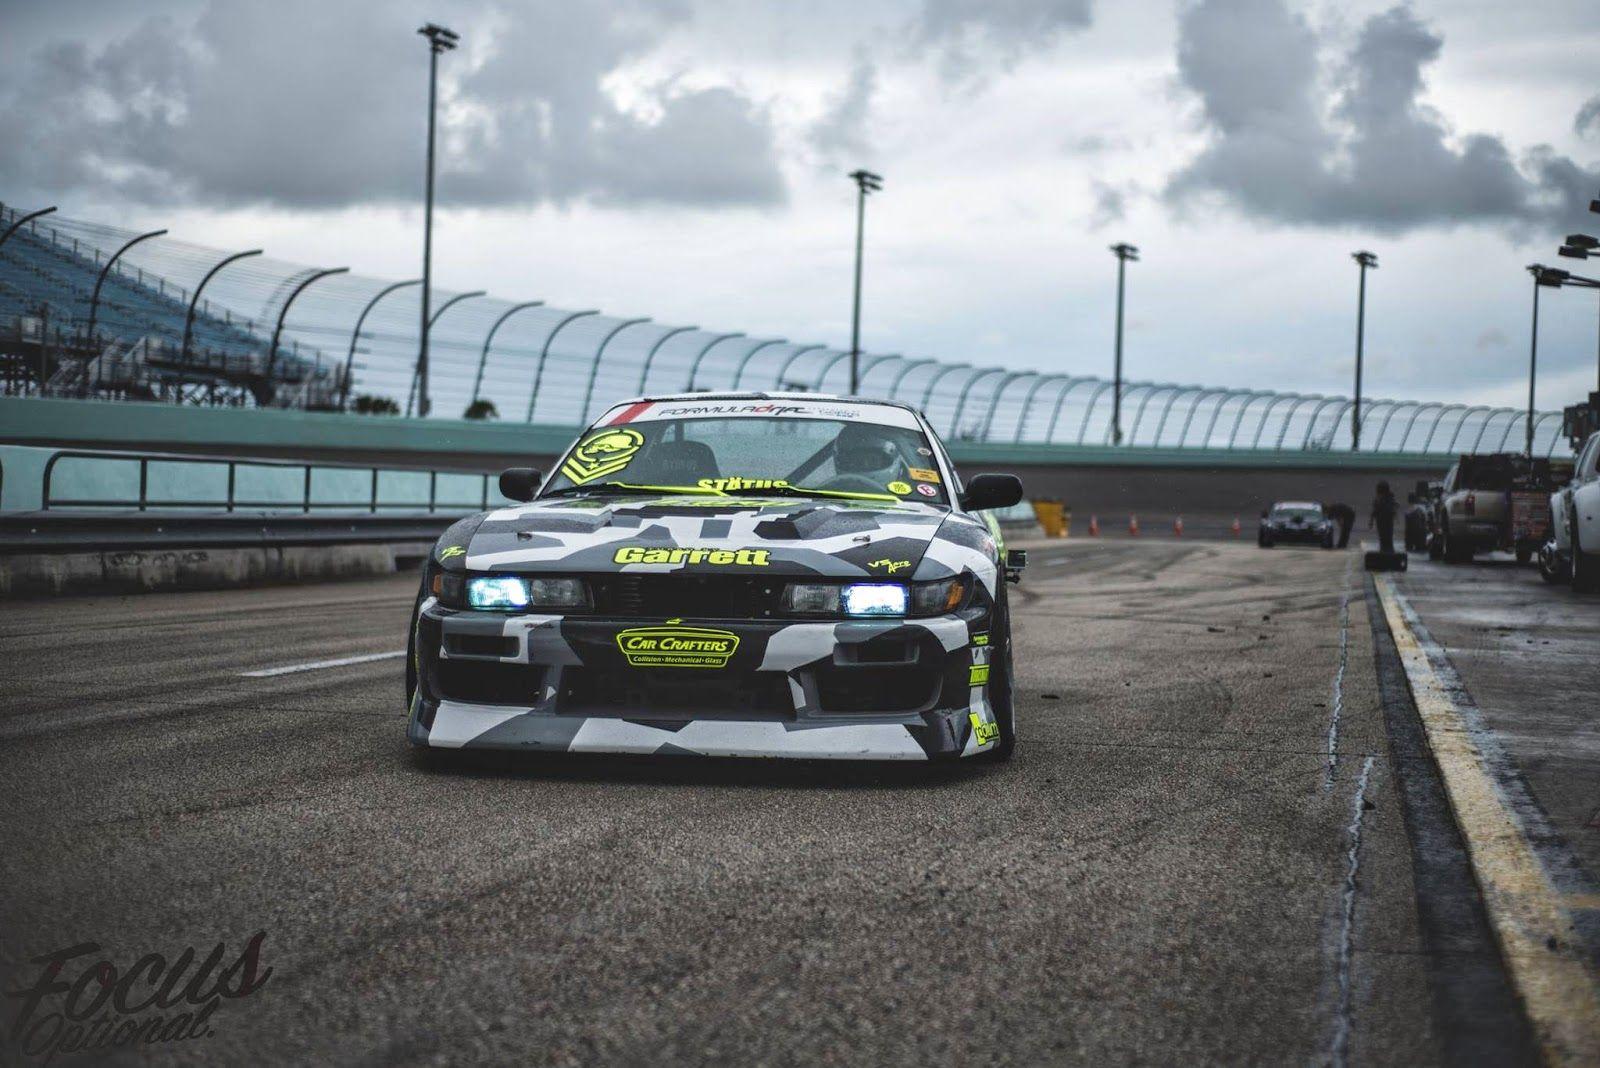 Explore formula drift racing and more